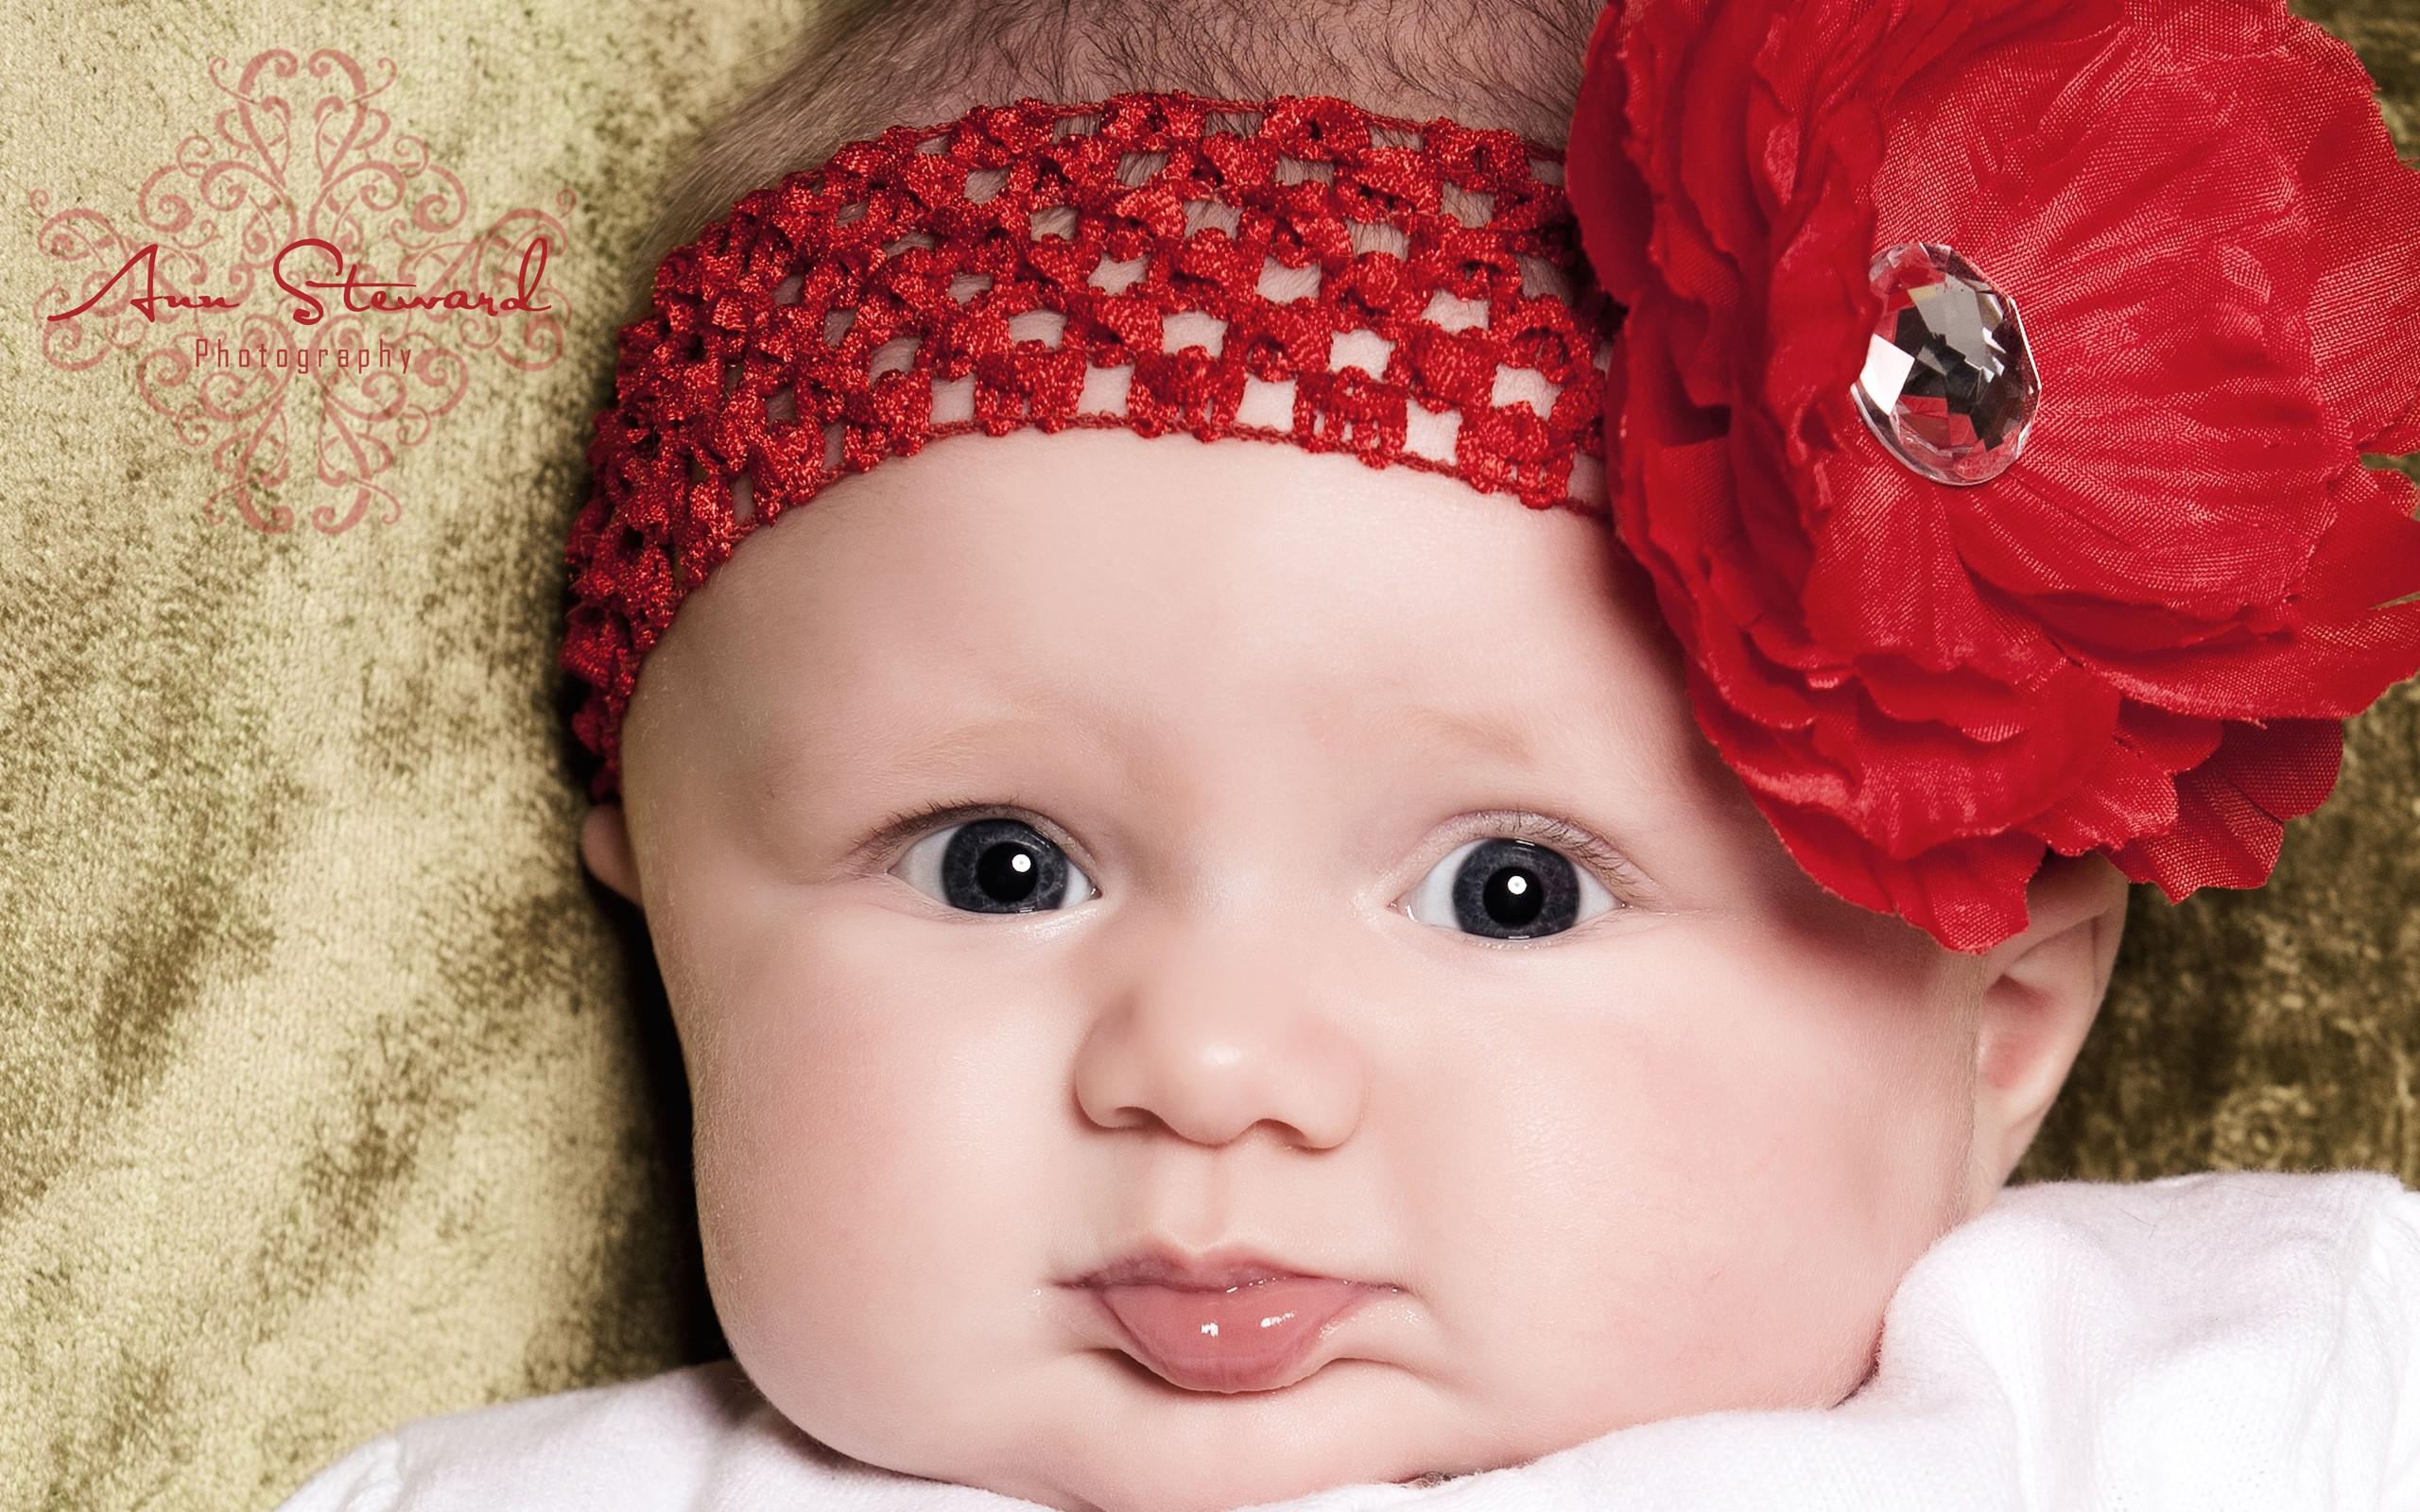 78 Best ideas about Cute Baby Wallpaper on Pinterest | Beautiful